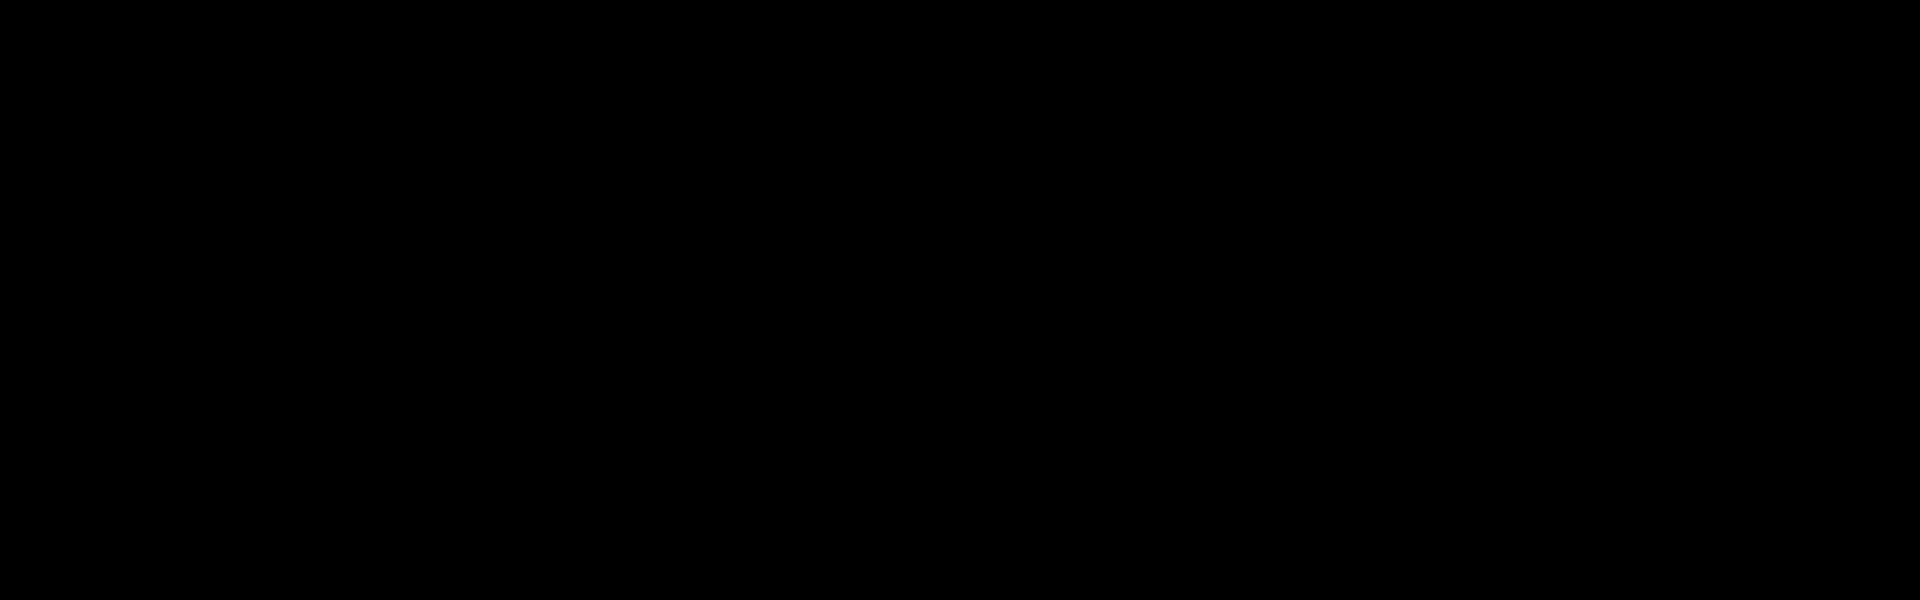 Bd Revo Slider Nnr020 2